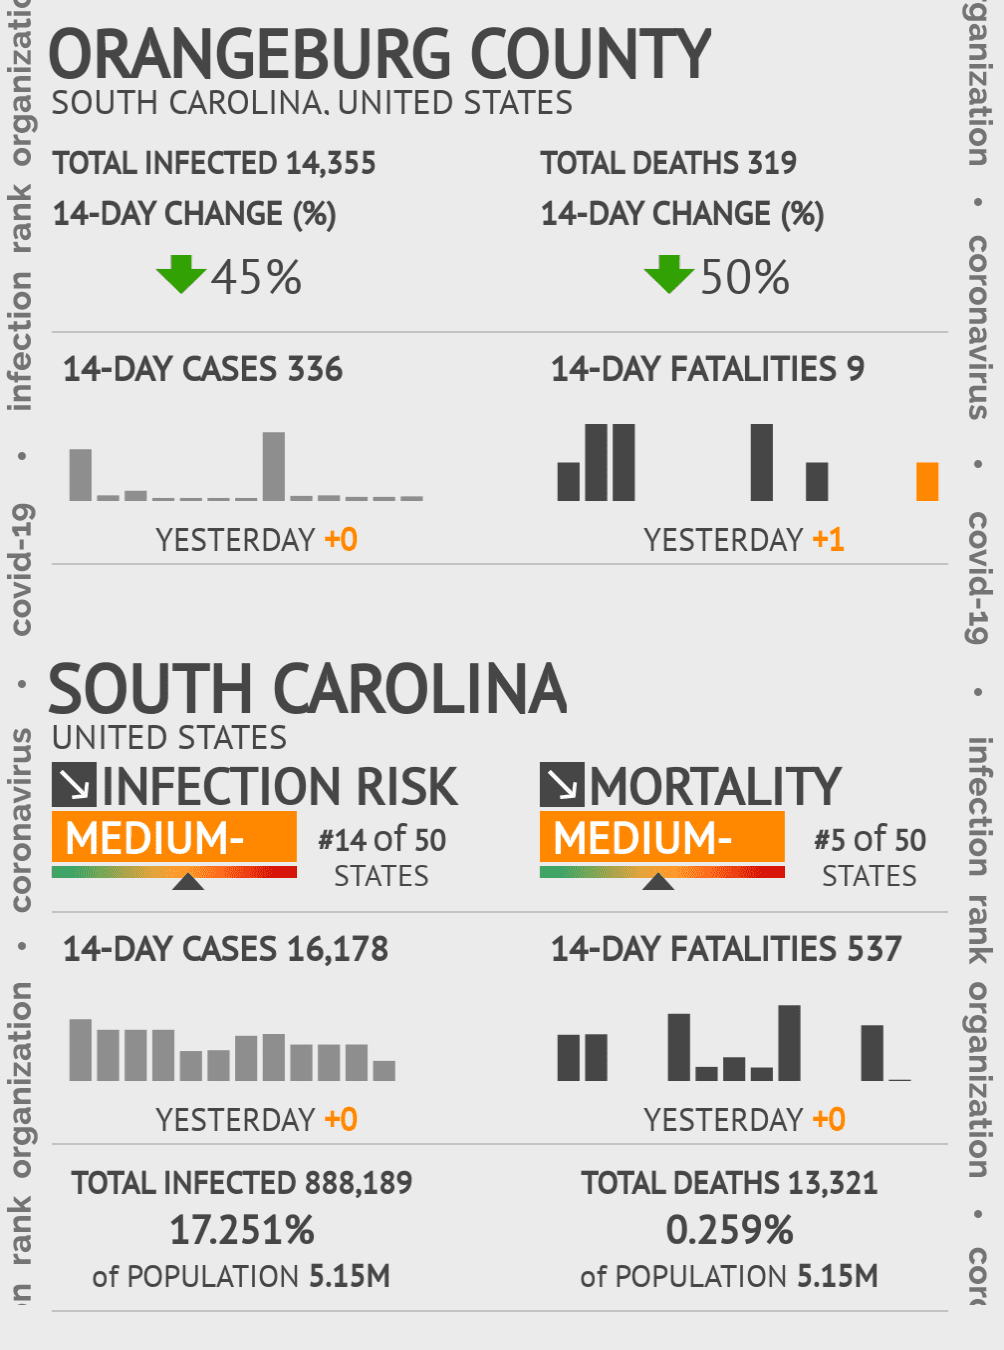 Orangeburg County Coronavirus Covid-19 Risk of Infection on July 24, 2021